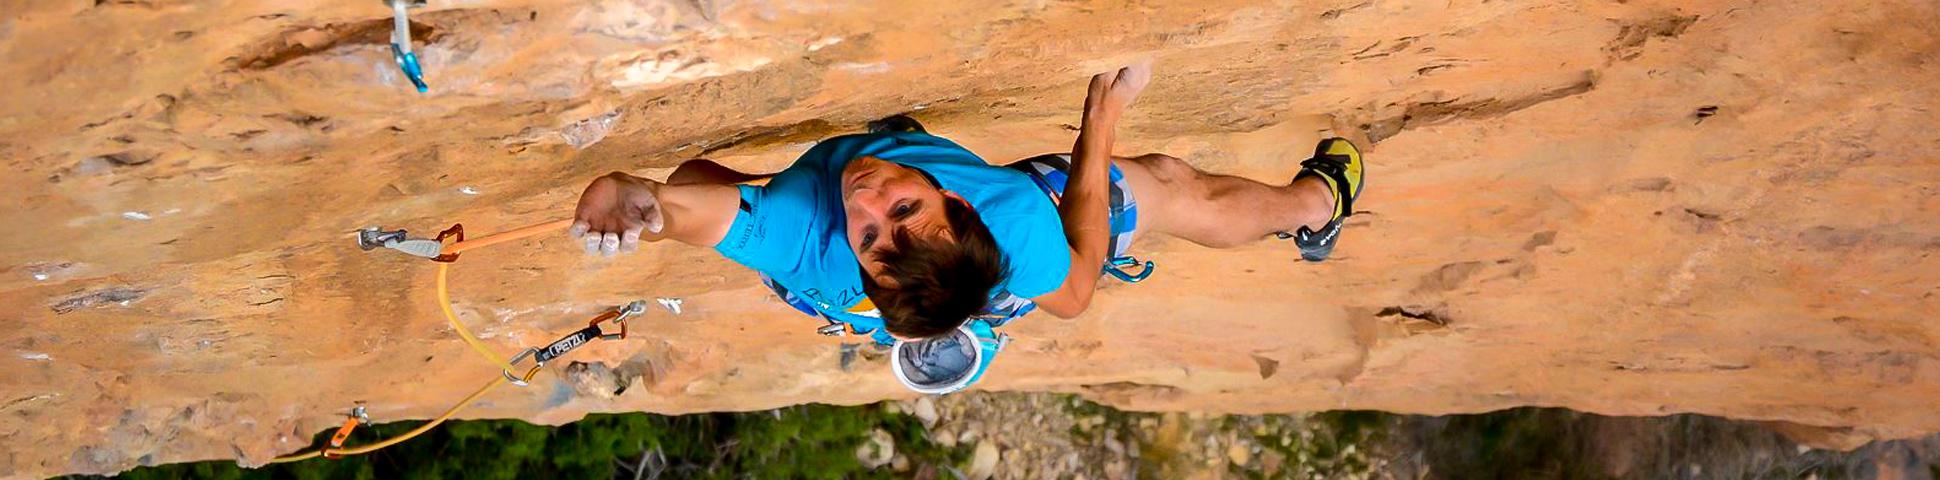 Amazing rock climbing wall in Spain